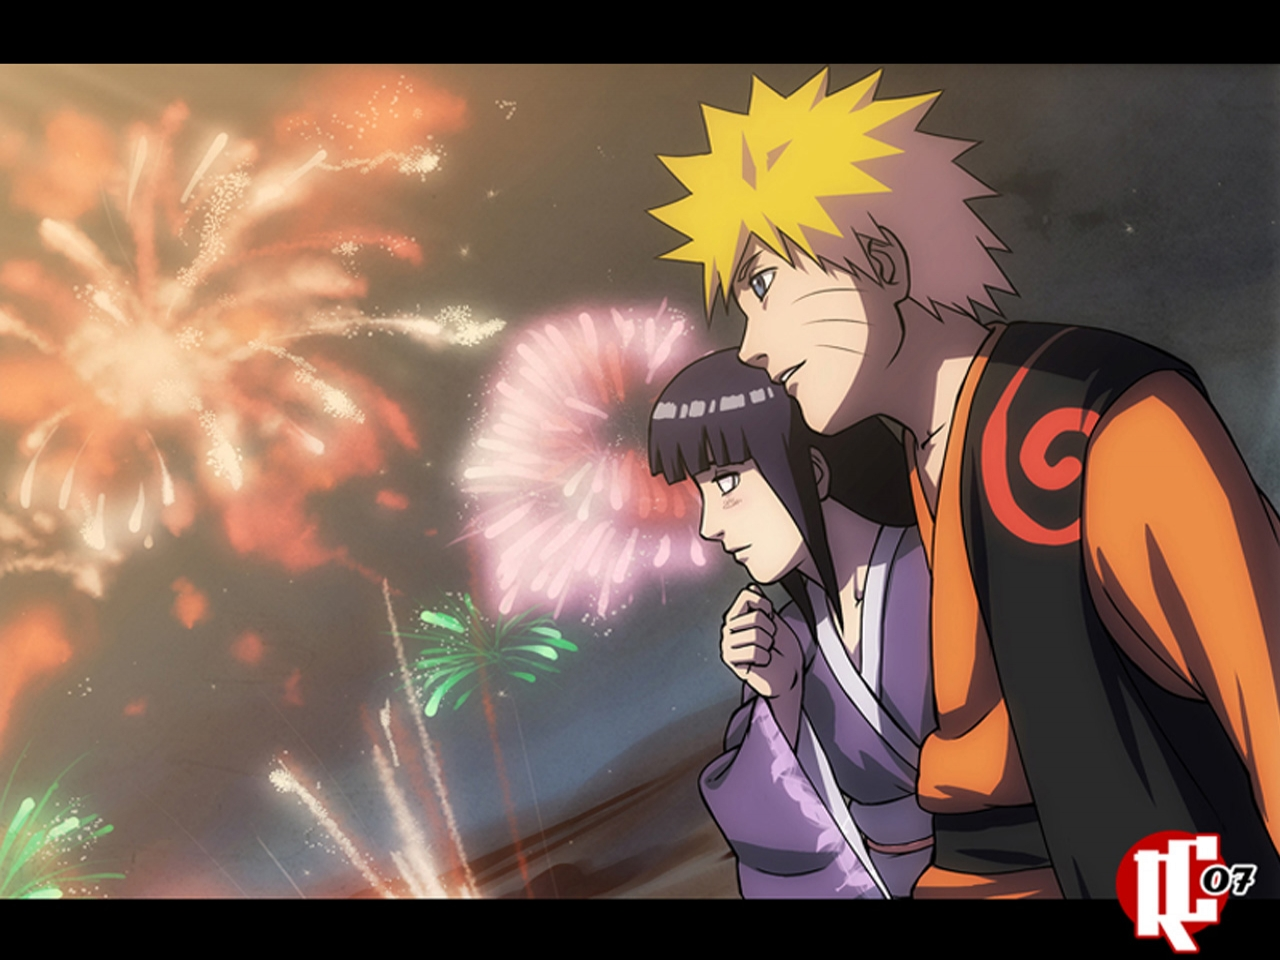 HD Naruto Wallpapers 1280x960